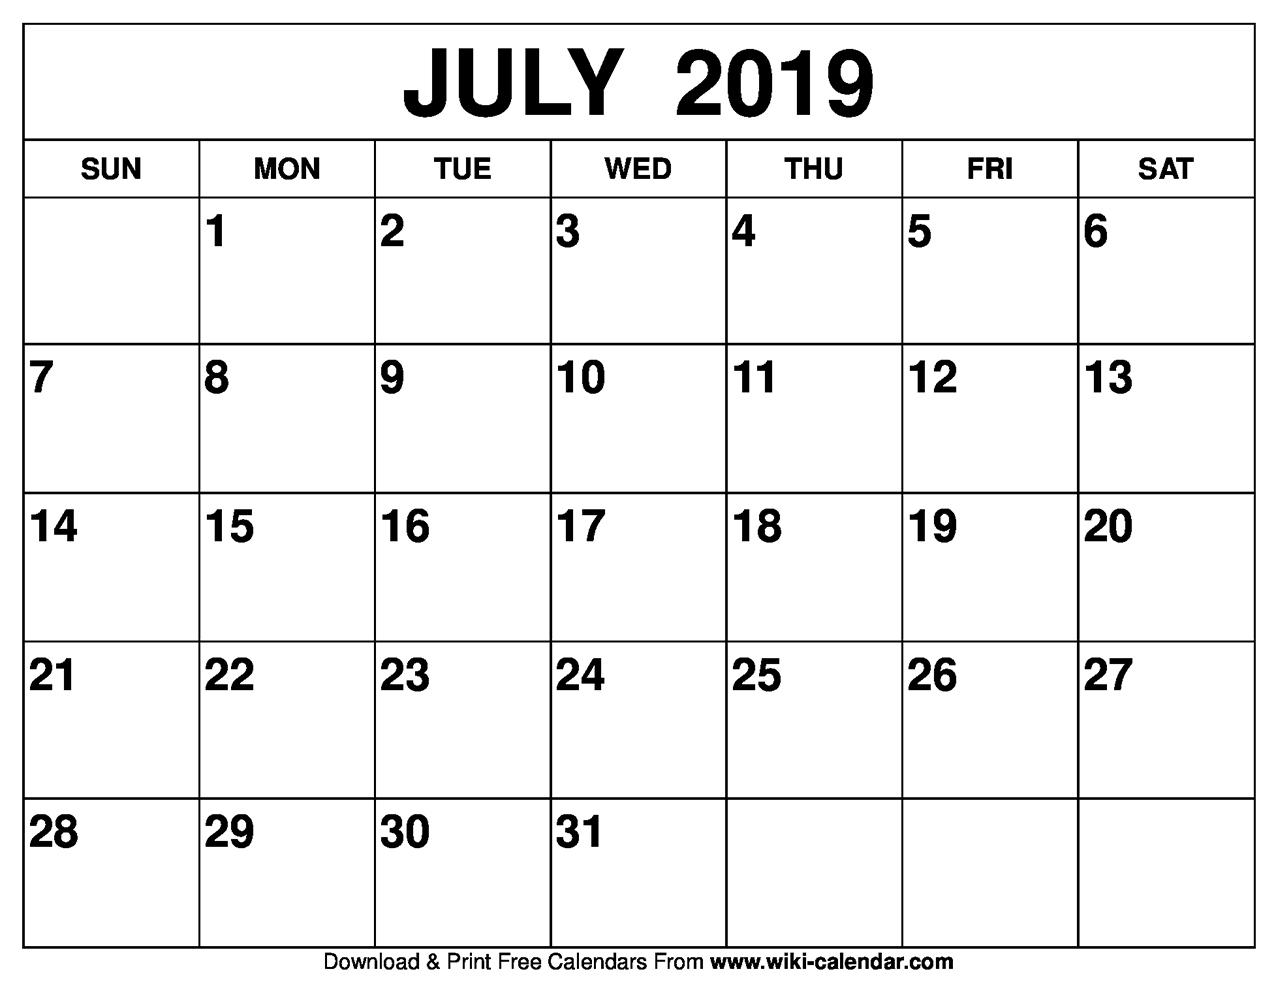 Blank July 2019 Calendar Printable throughout Blank July Calendar Printable